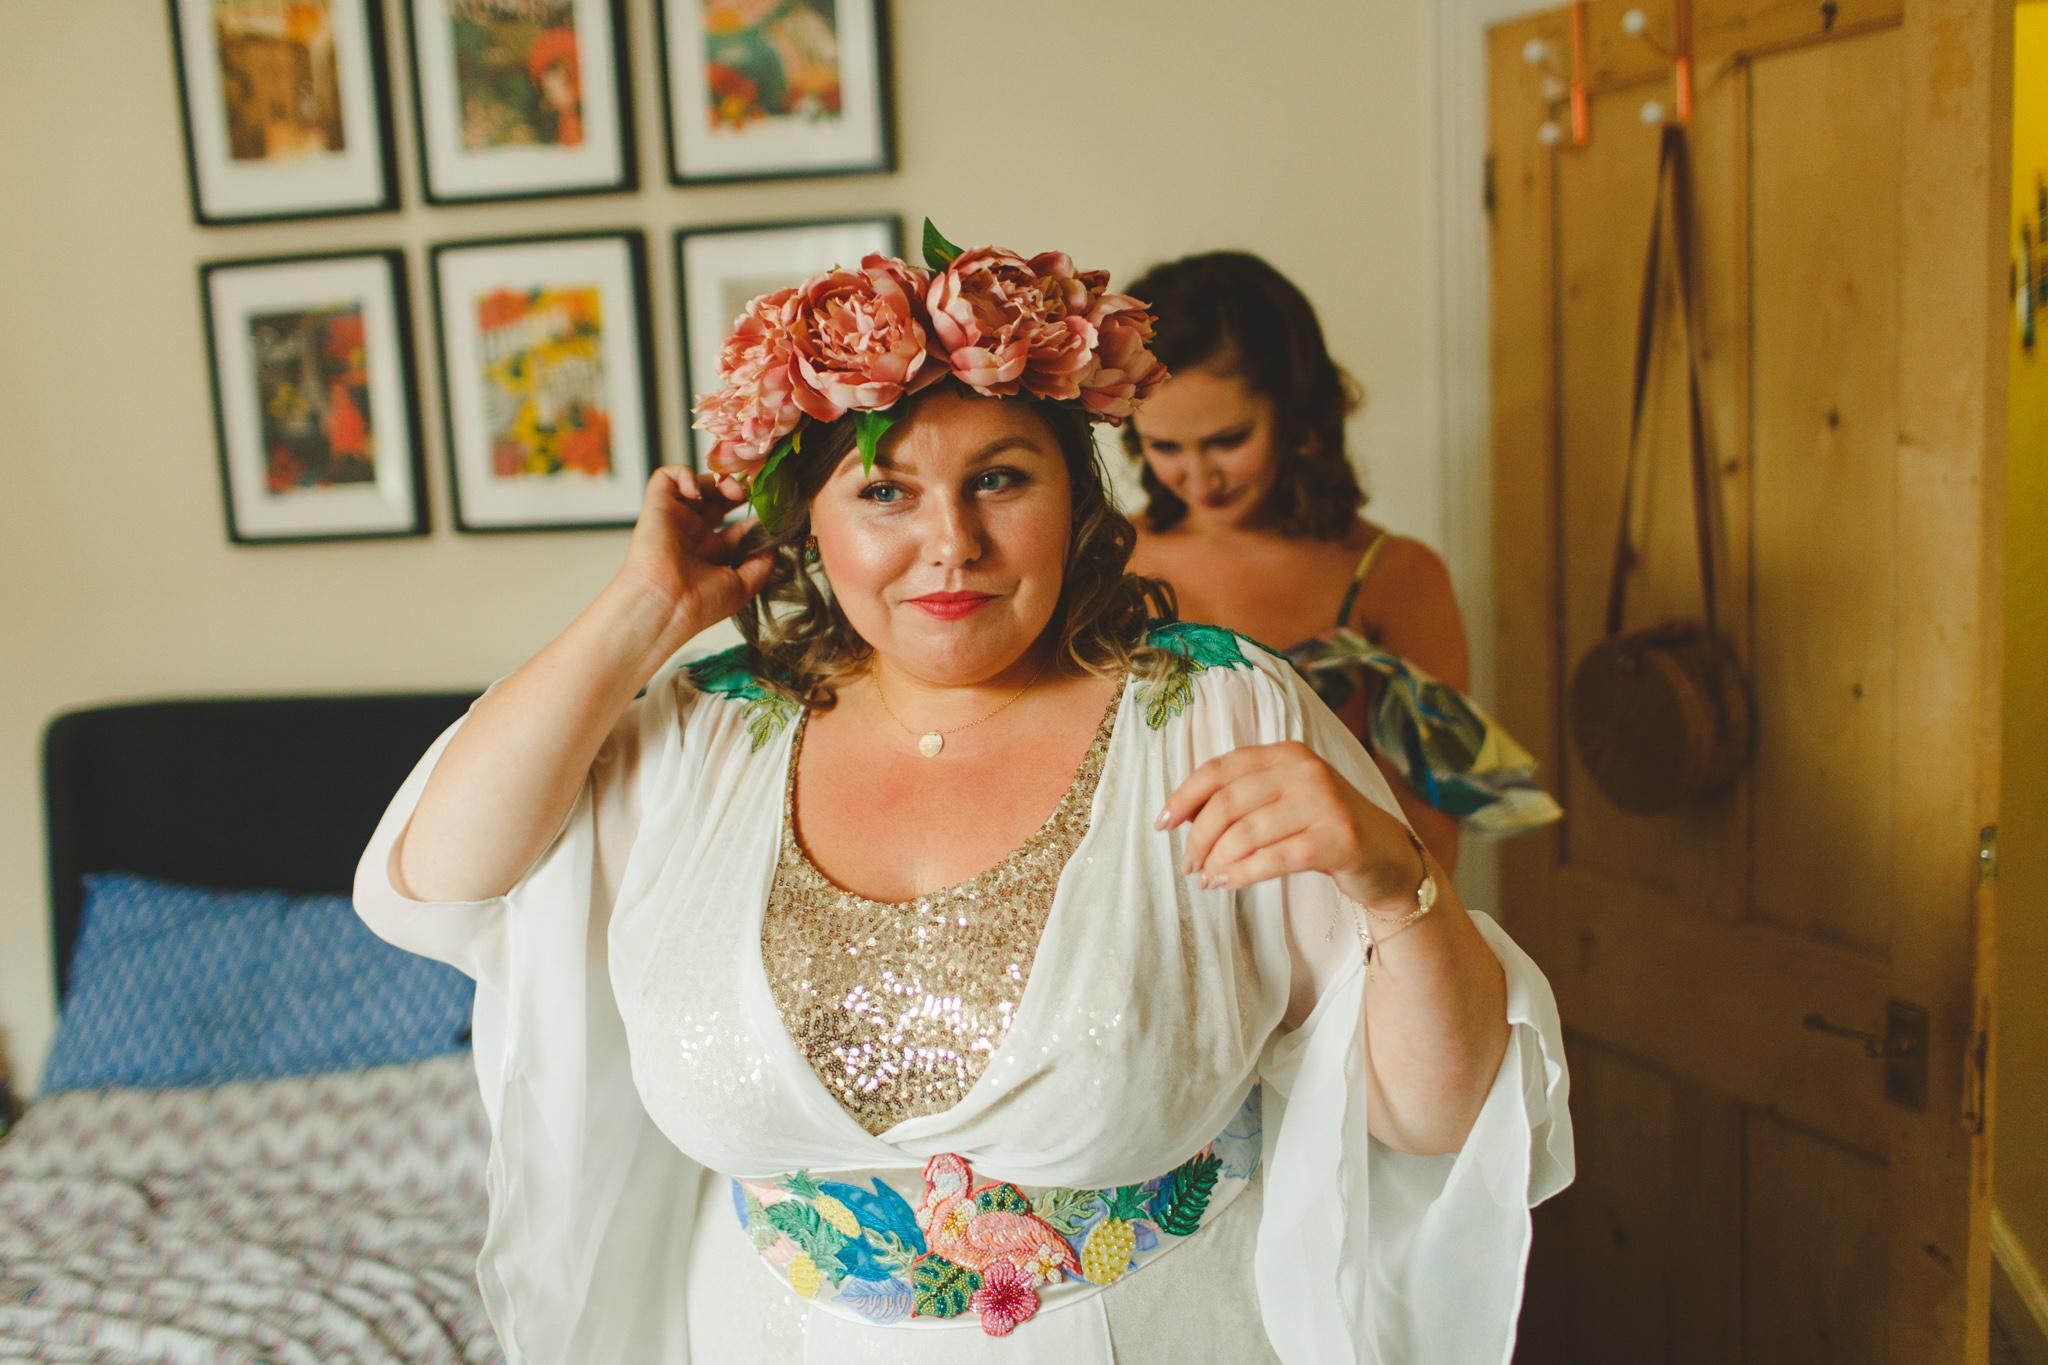 derbyshire-wedding-photographer-videographer-camera-hannah-74.jpg